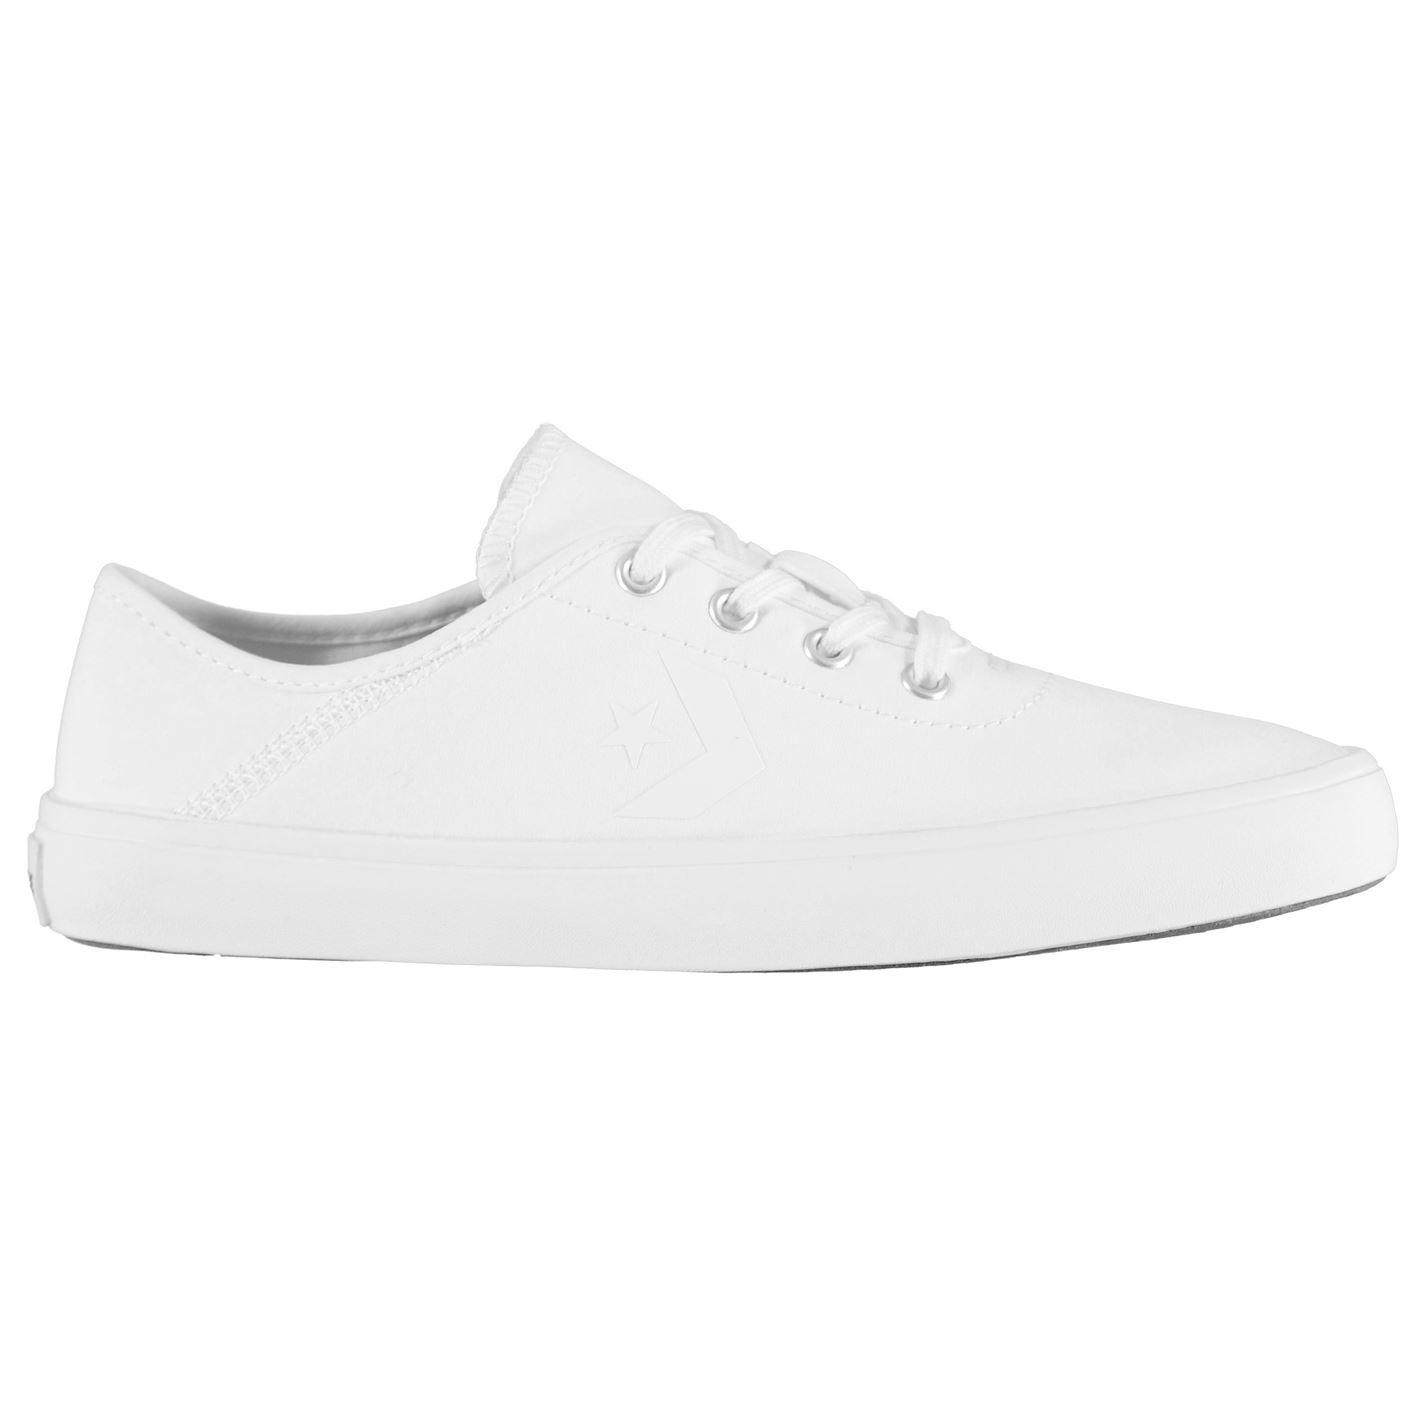 Converse Ox Costa Ladies Trainers White White - Glami.sk b5b50366ae